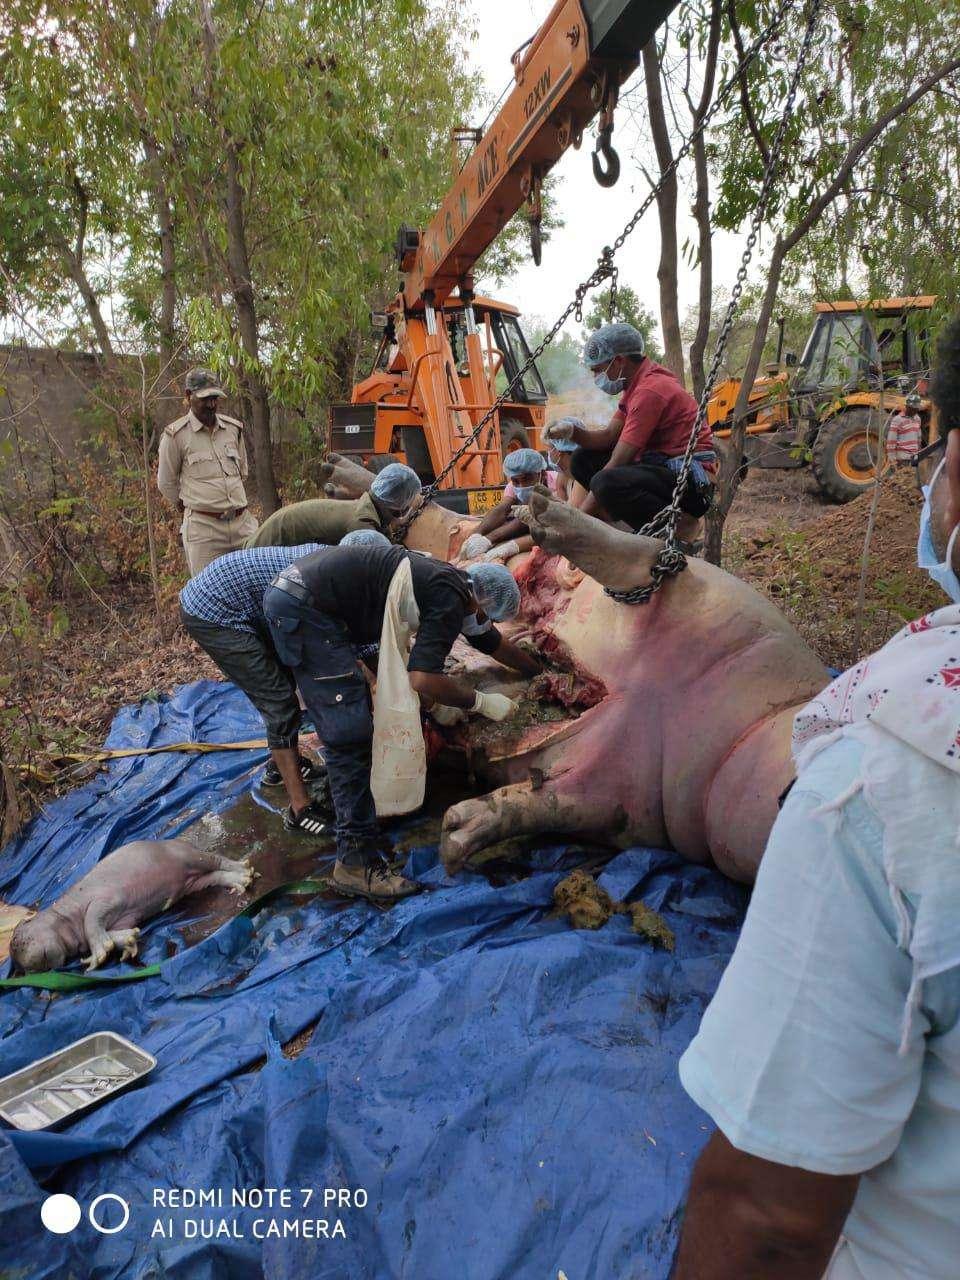 Hippo kid found in post-mortem In zoological garden in Chhattisgarh